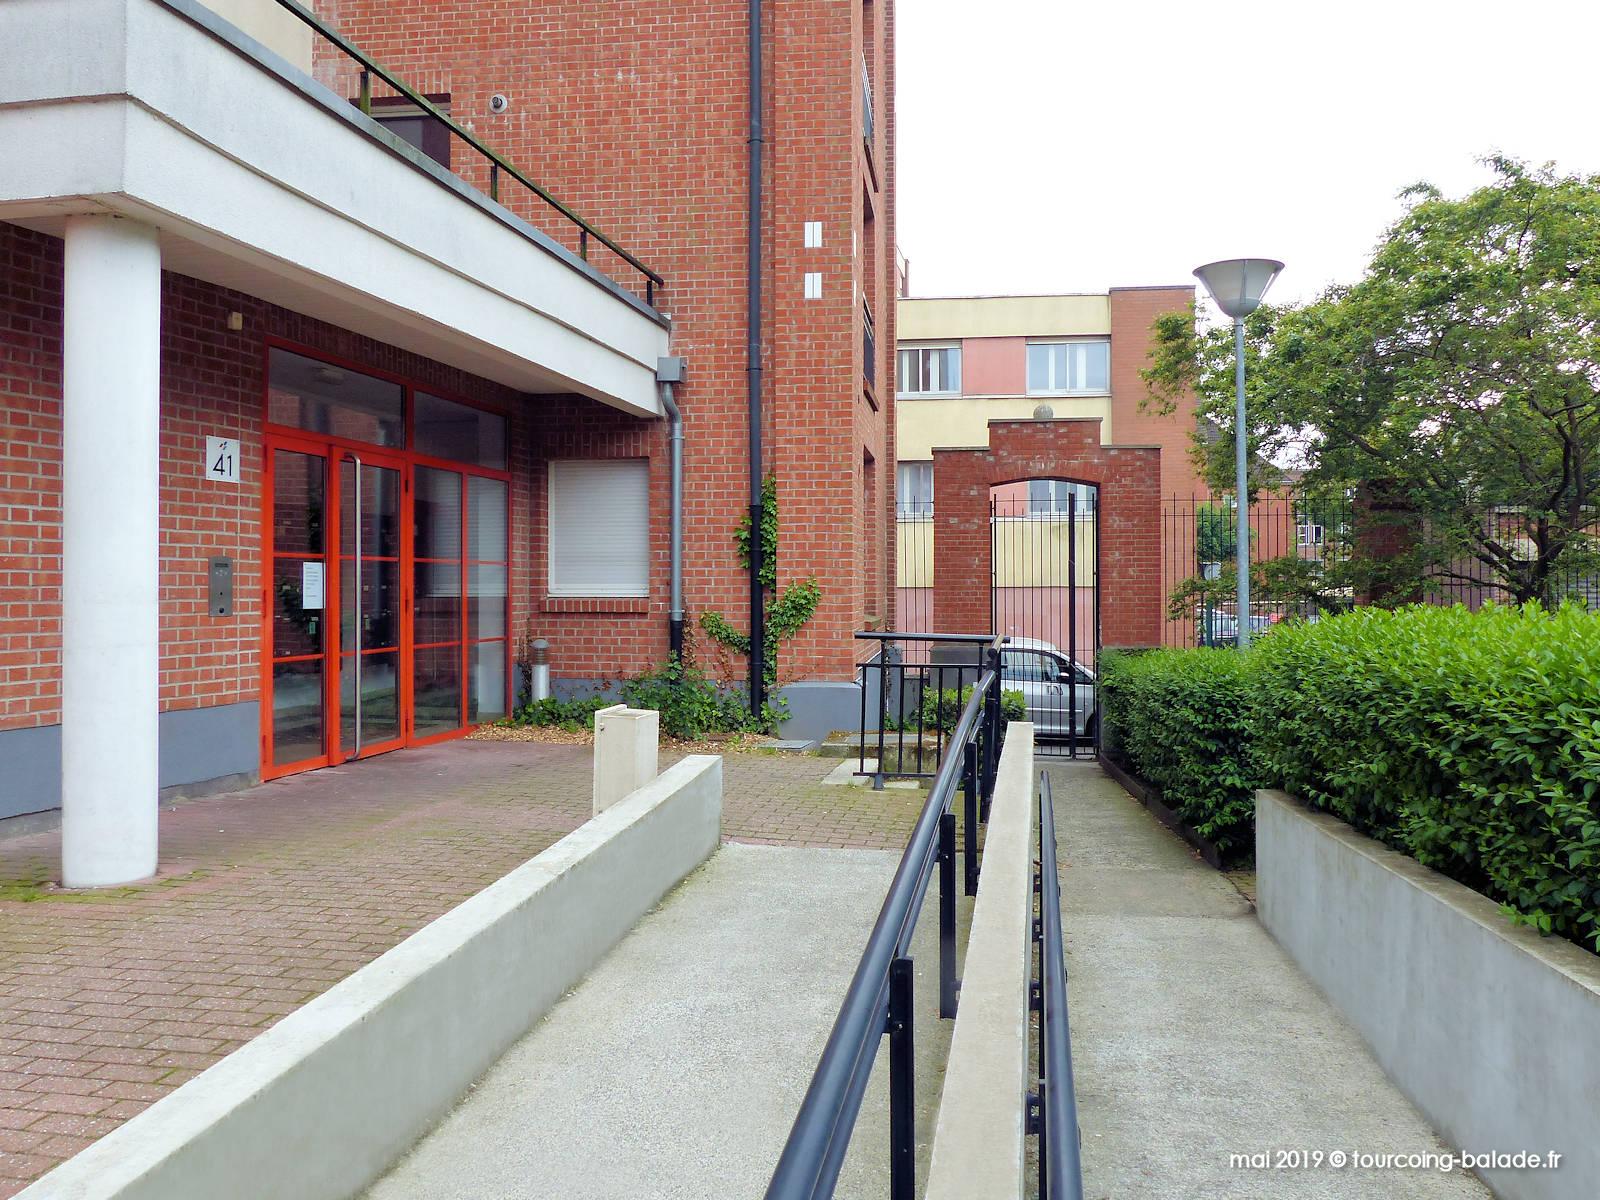 Rampe d'accès fauteuil roulant, Résidence Turenne, Tourcoing